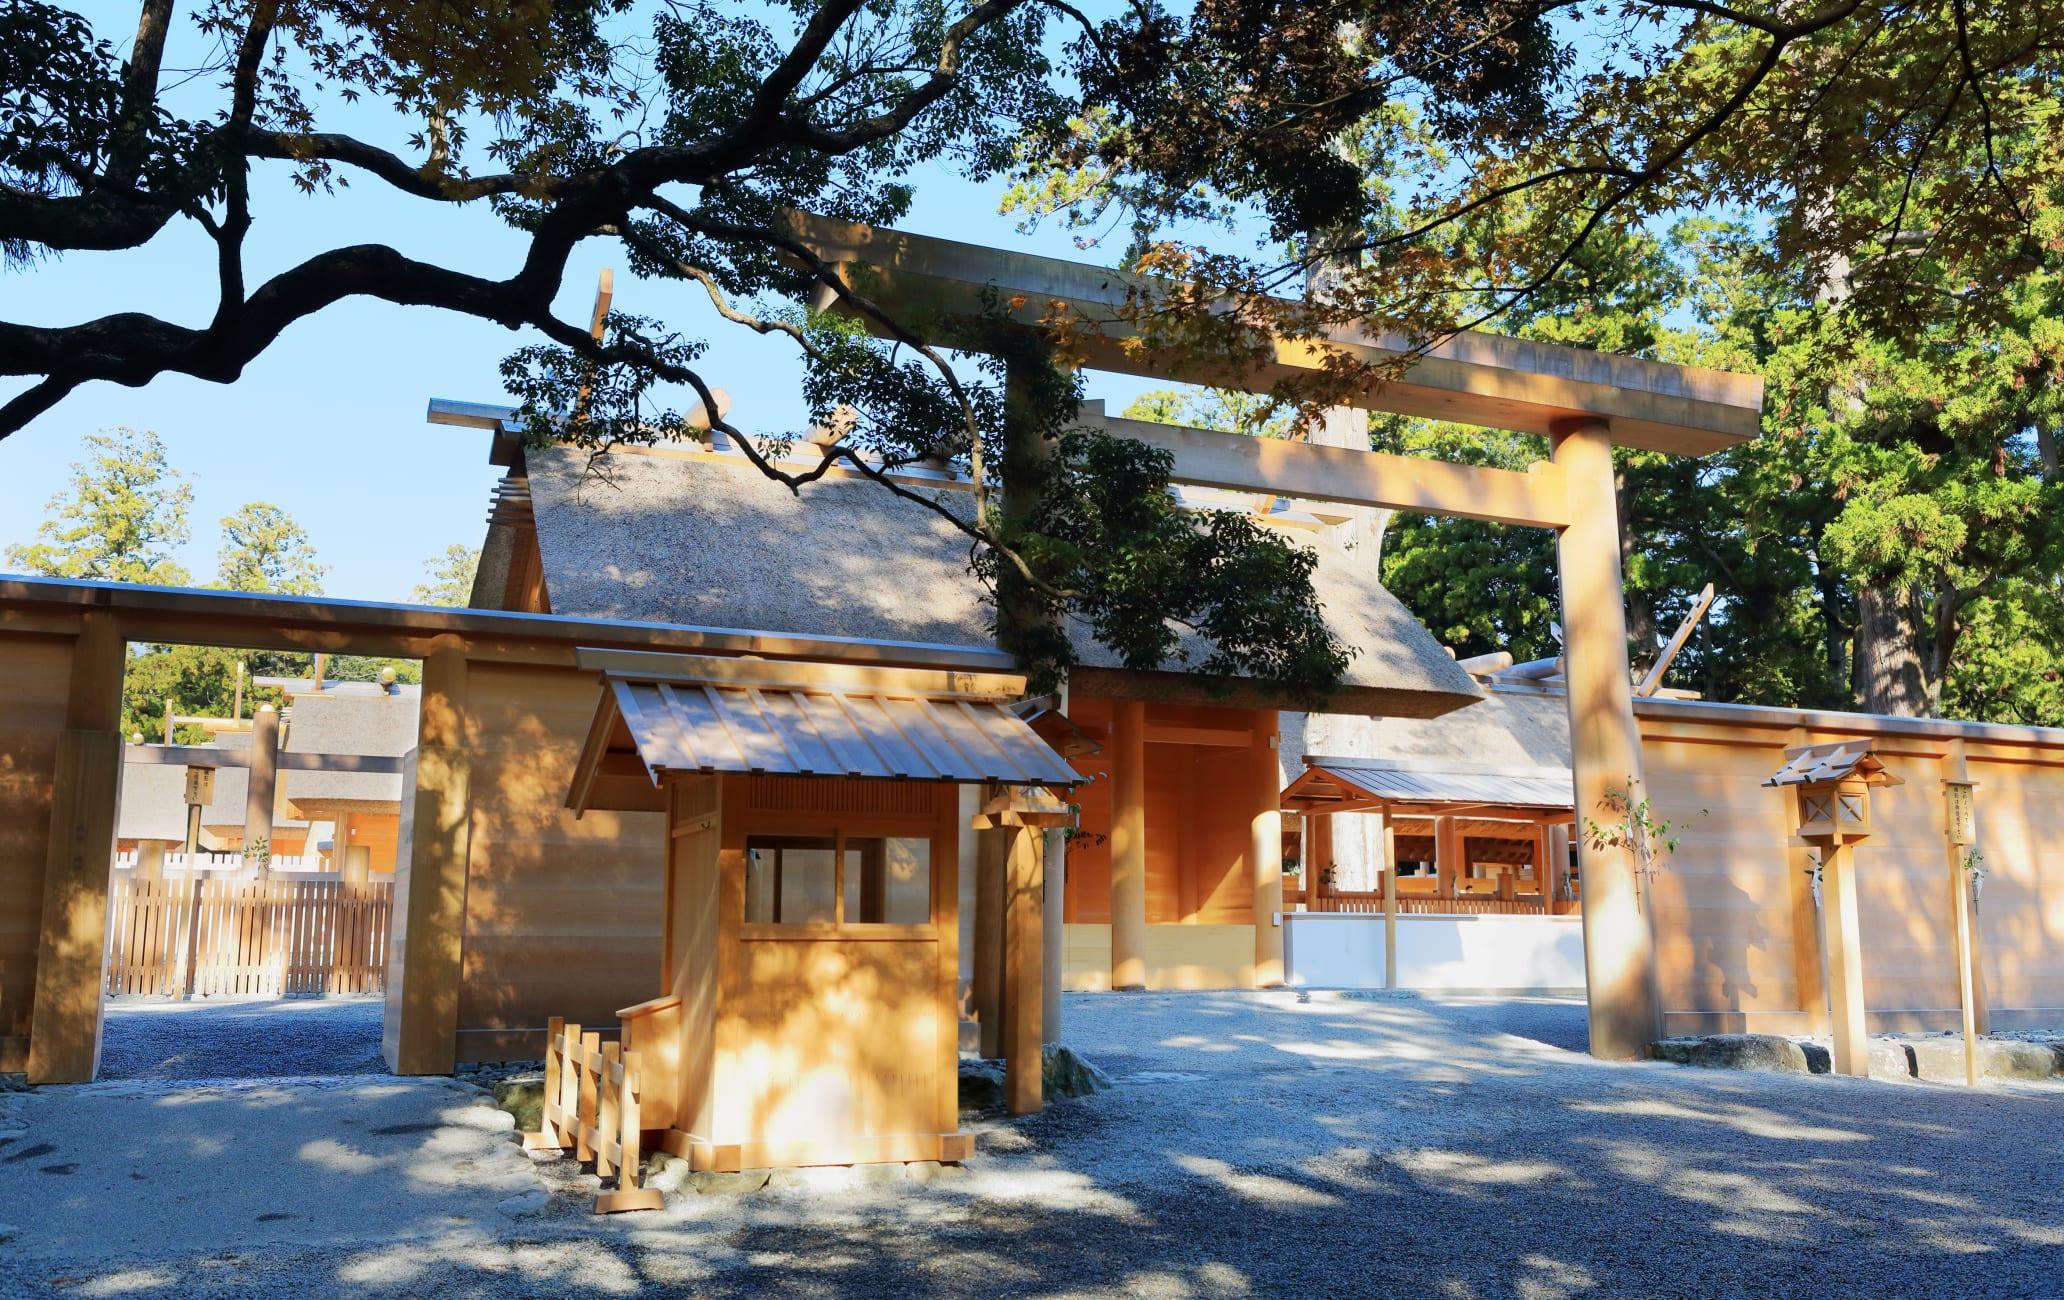 Ise-jingu Geku Shrine